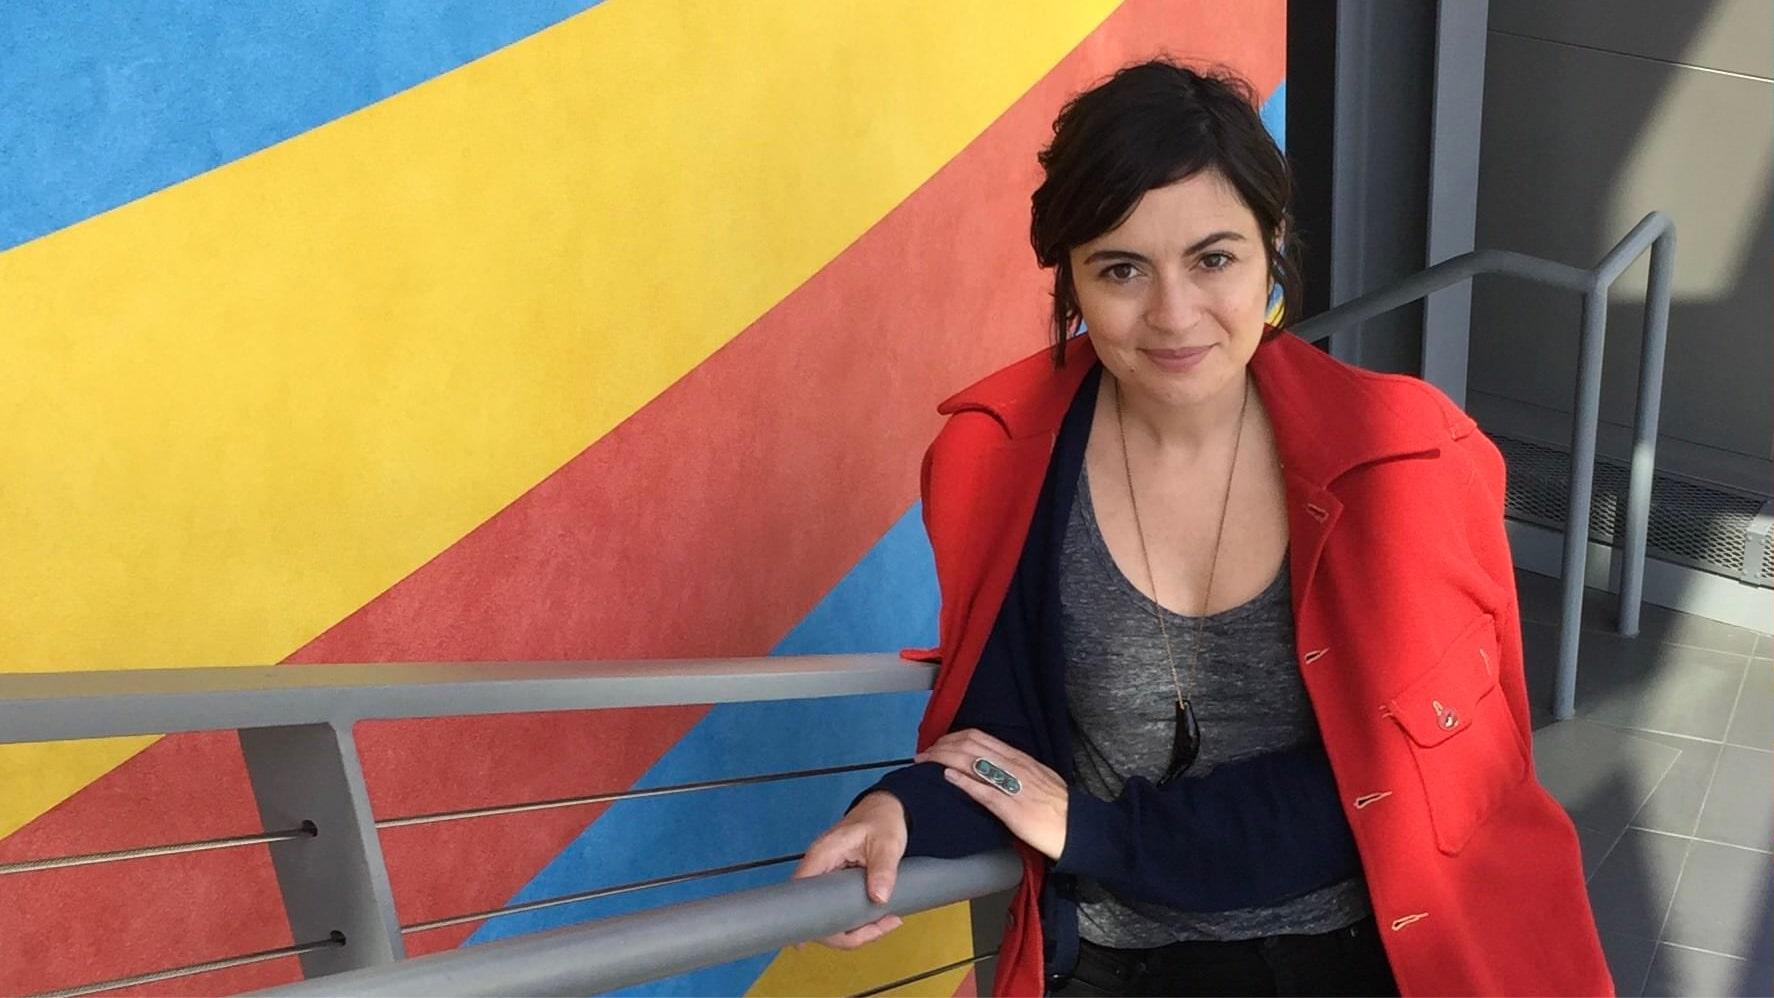 Sarah Braunstein on colorful background